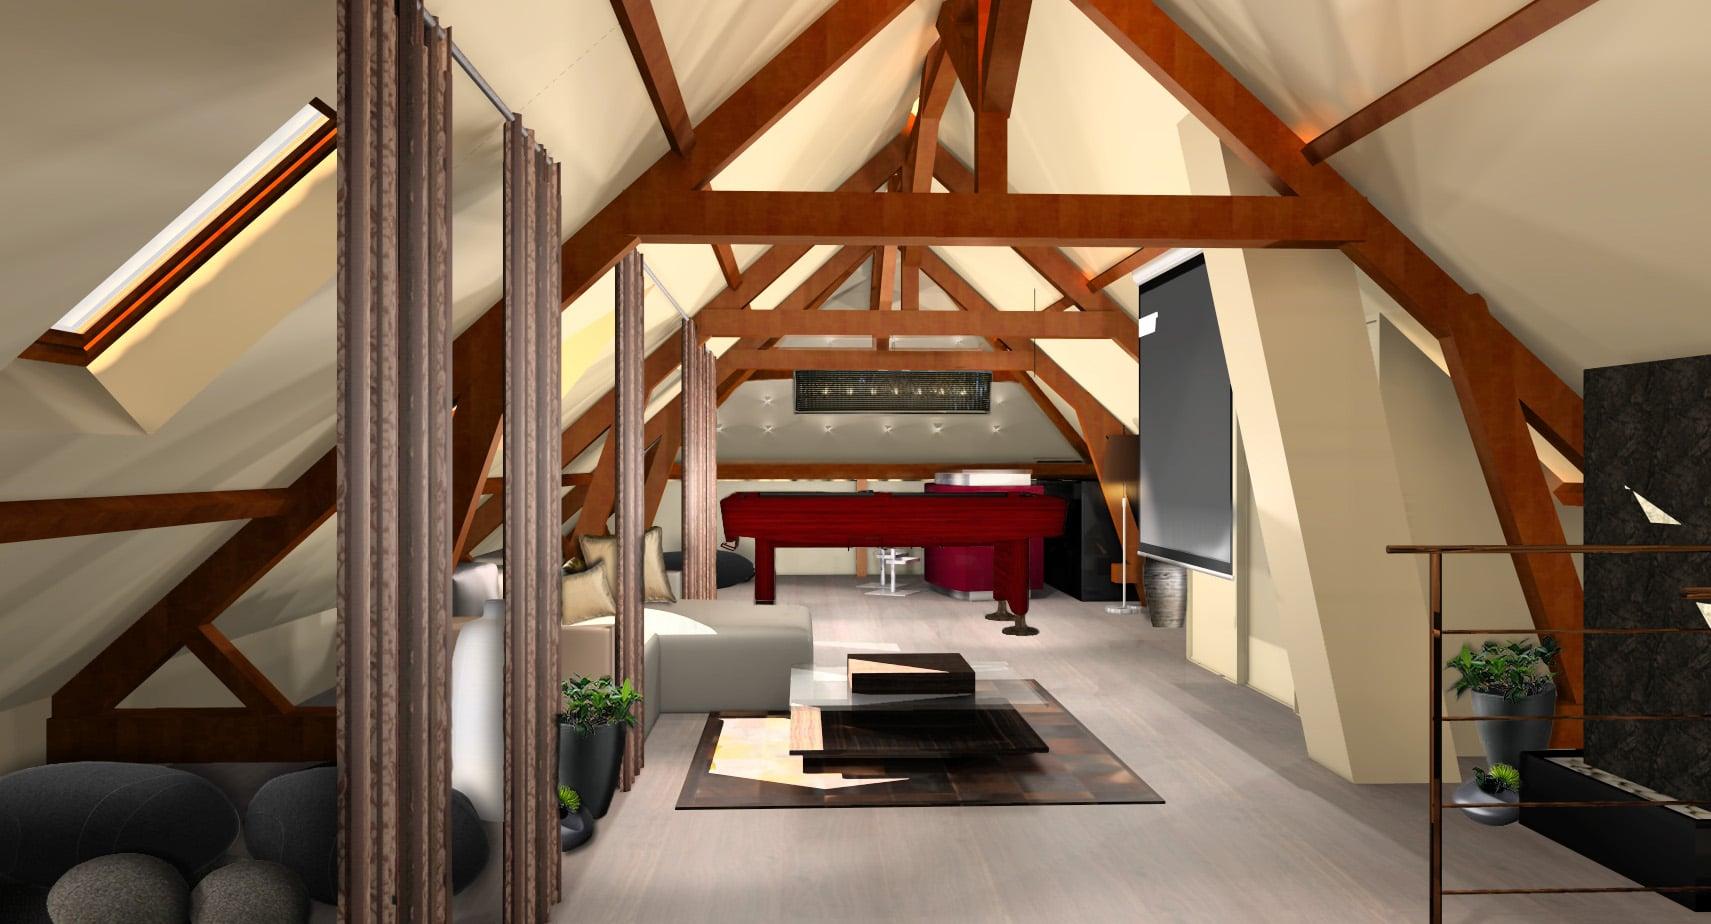 comment transformer ses combles en espace habitable. Black Bedroom Furniture Sets. Home Design Ideas